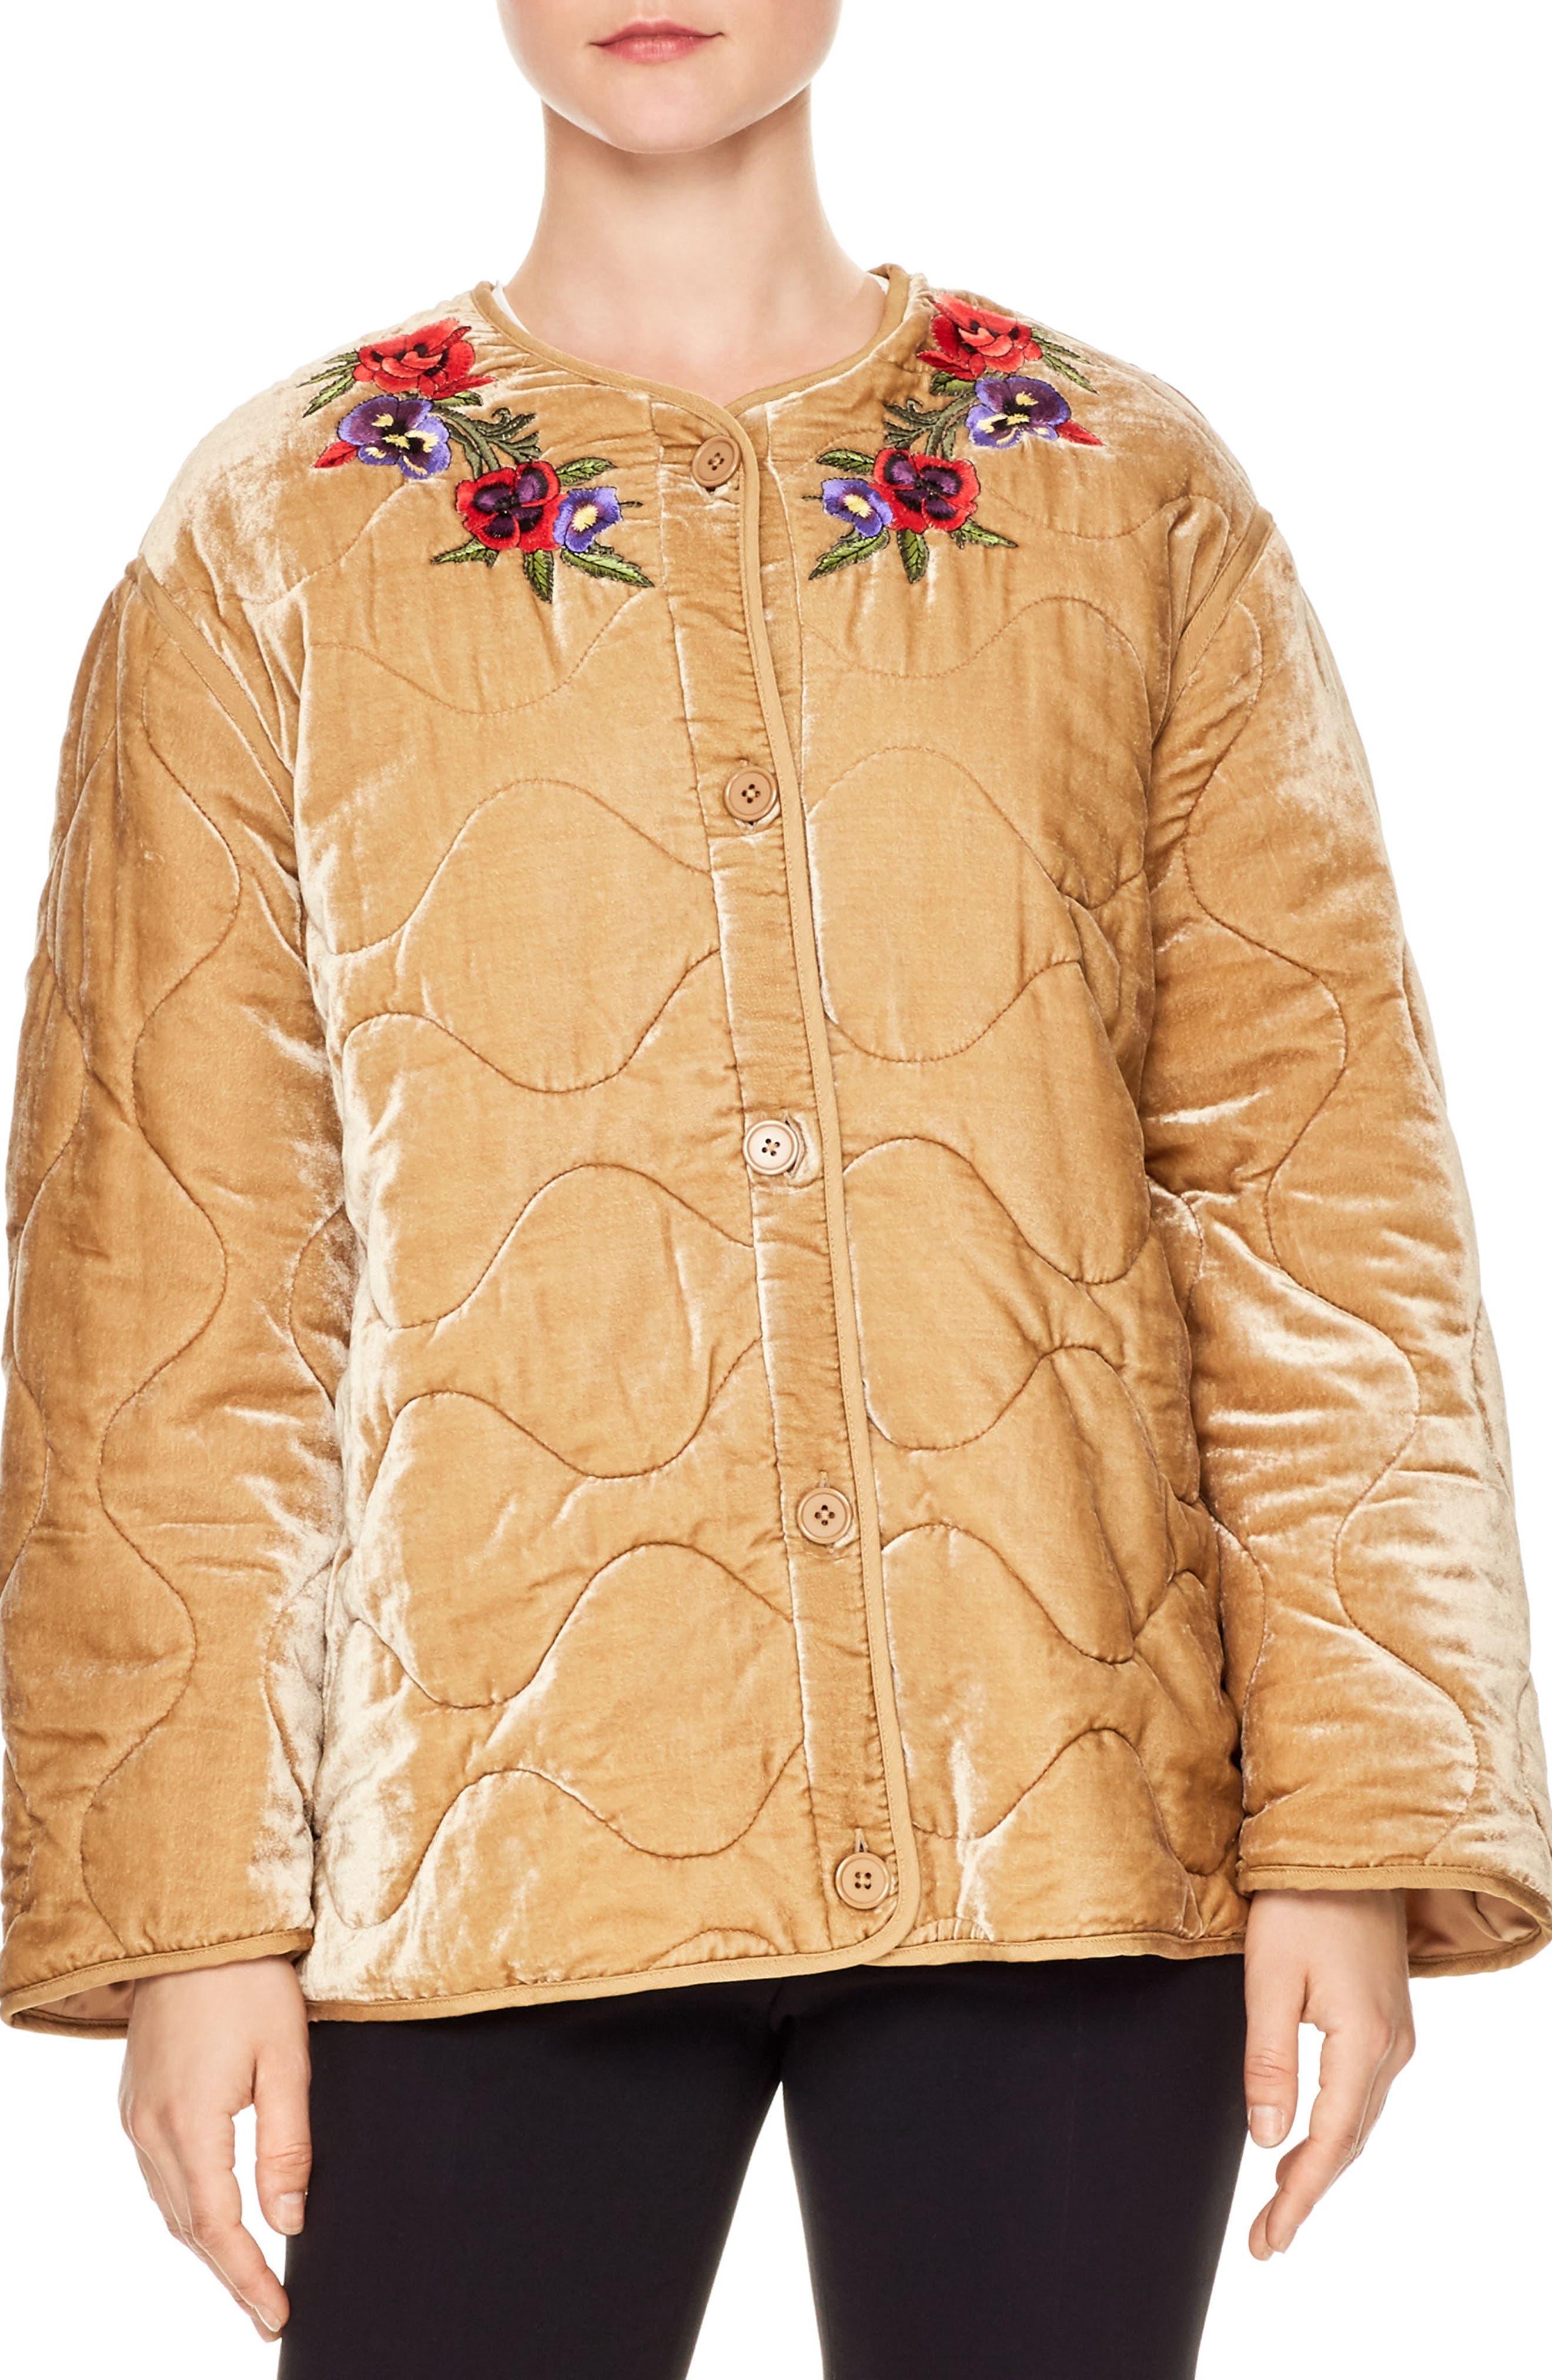 Reva Quilted Velvet Jacket,                             Main thumbnail 1, color,                             251